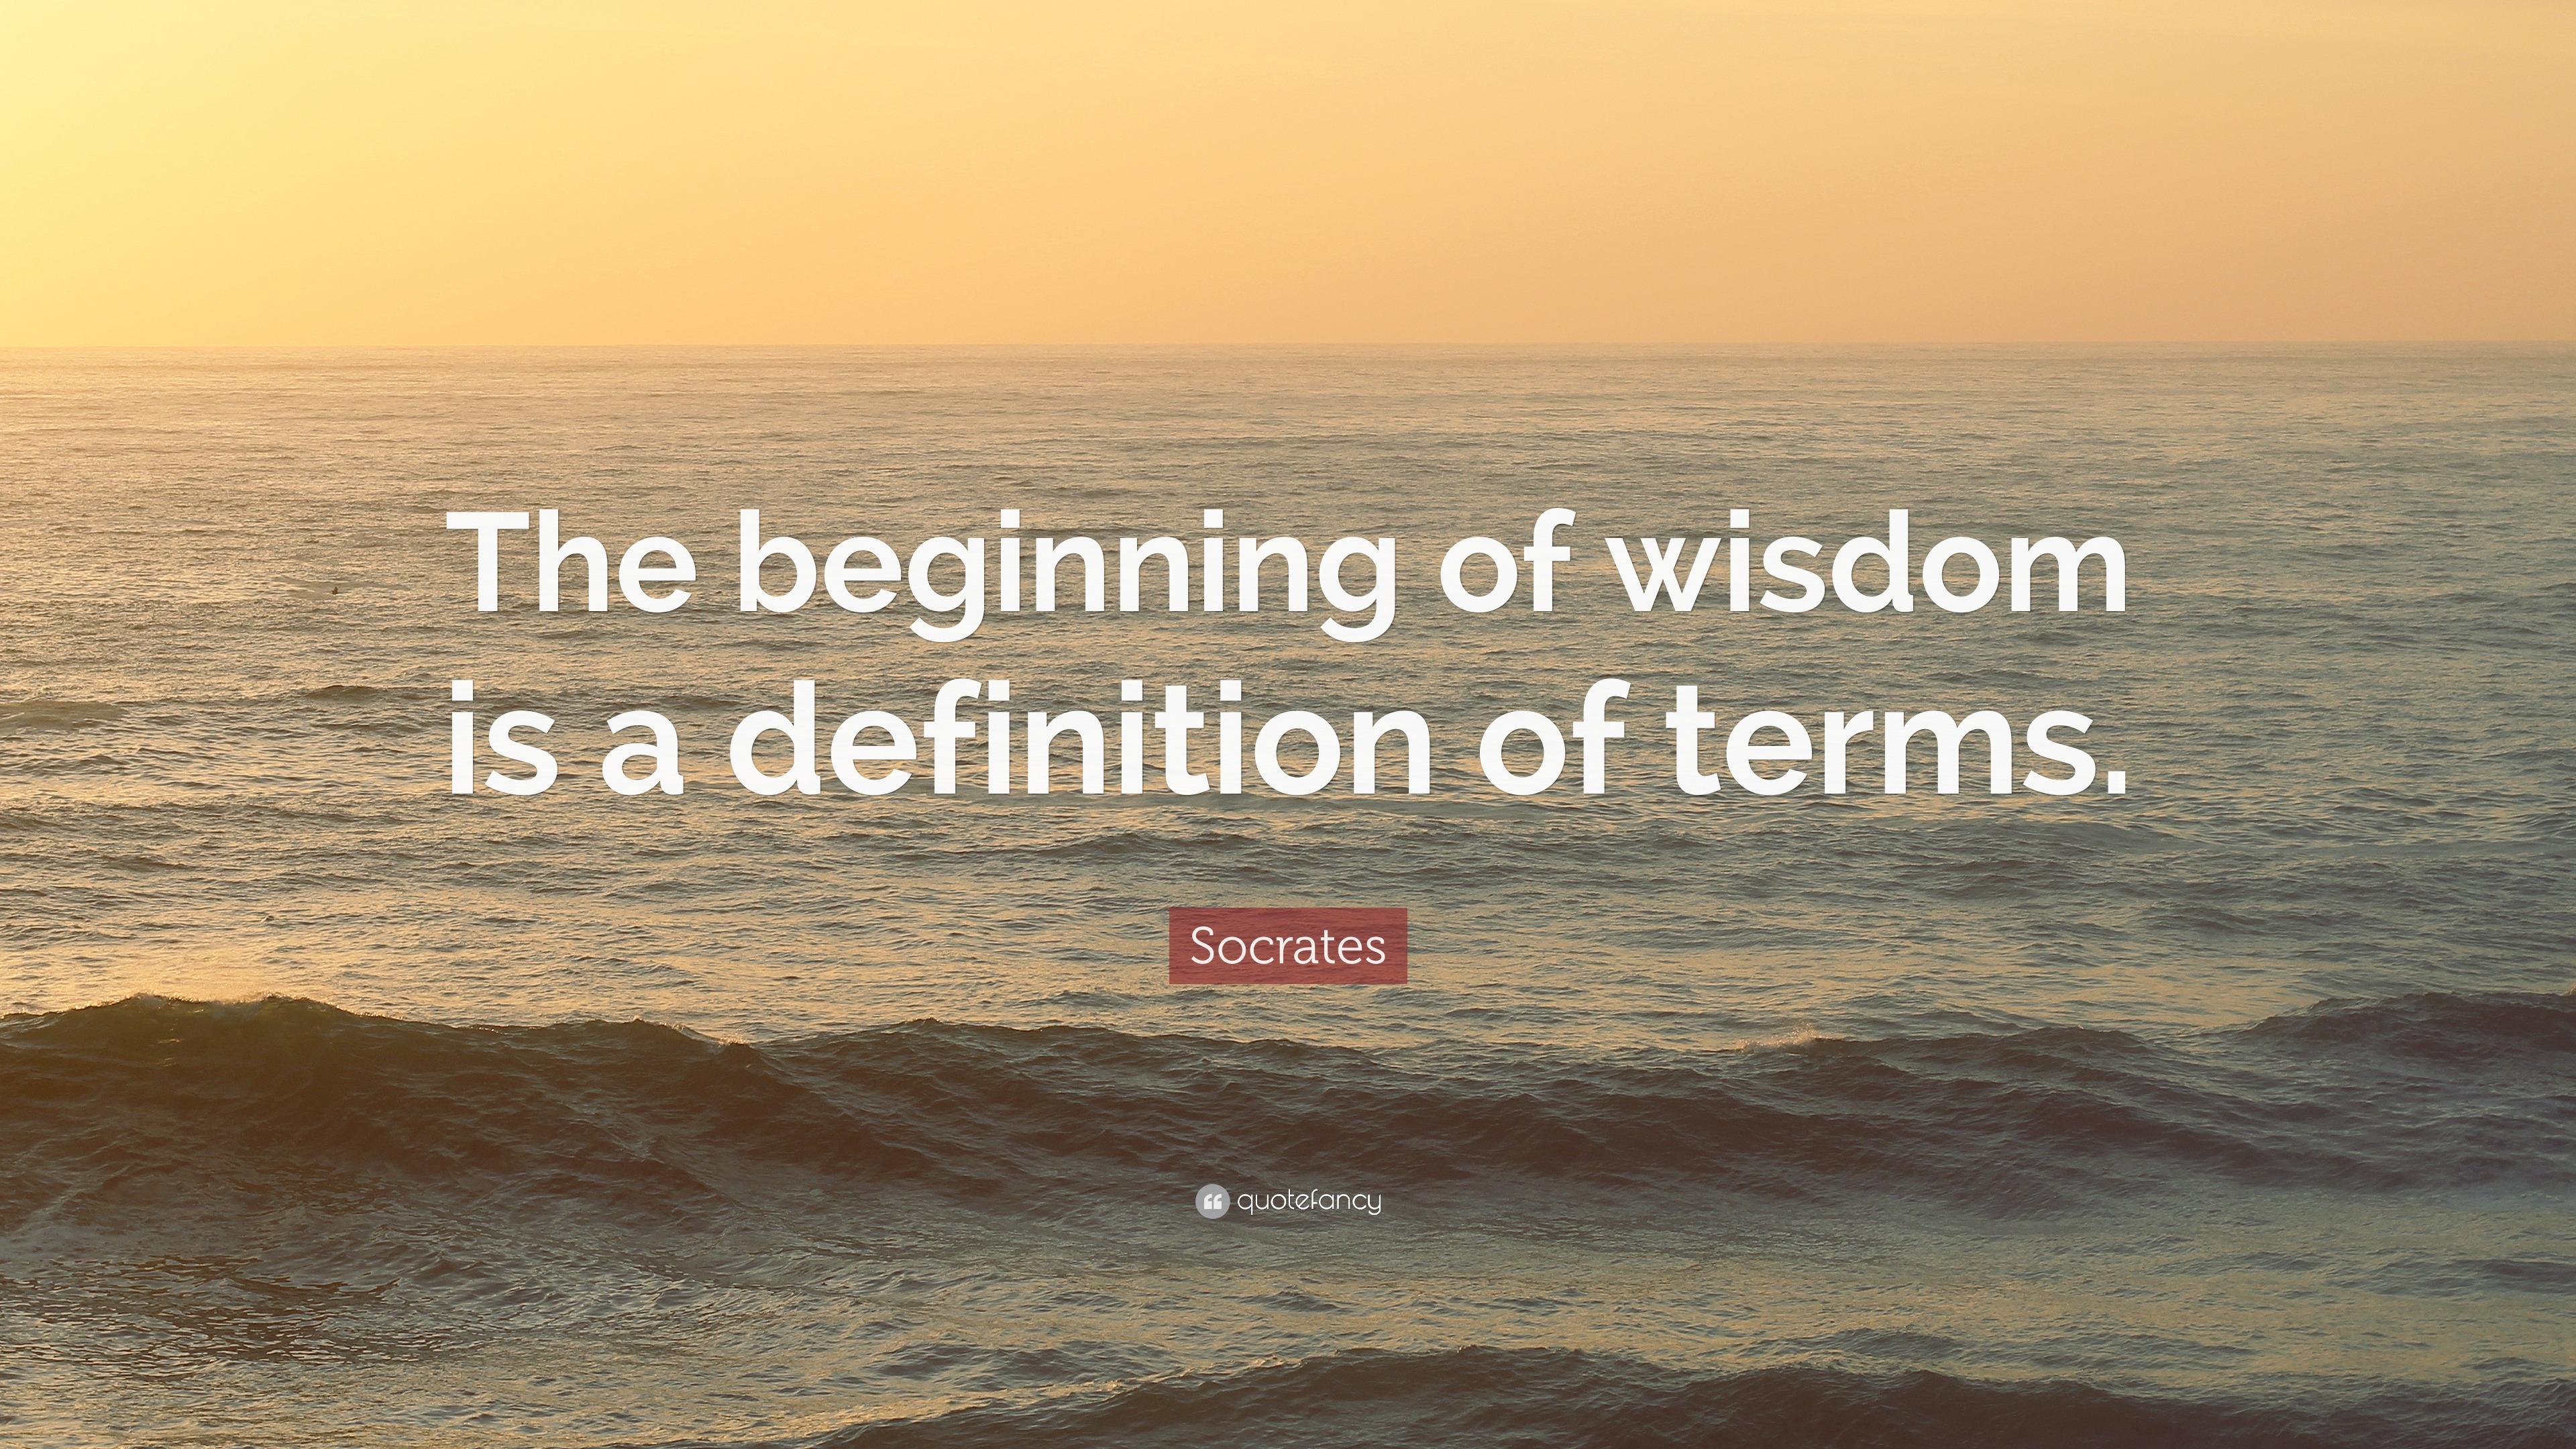 socrates definition of wisdom